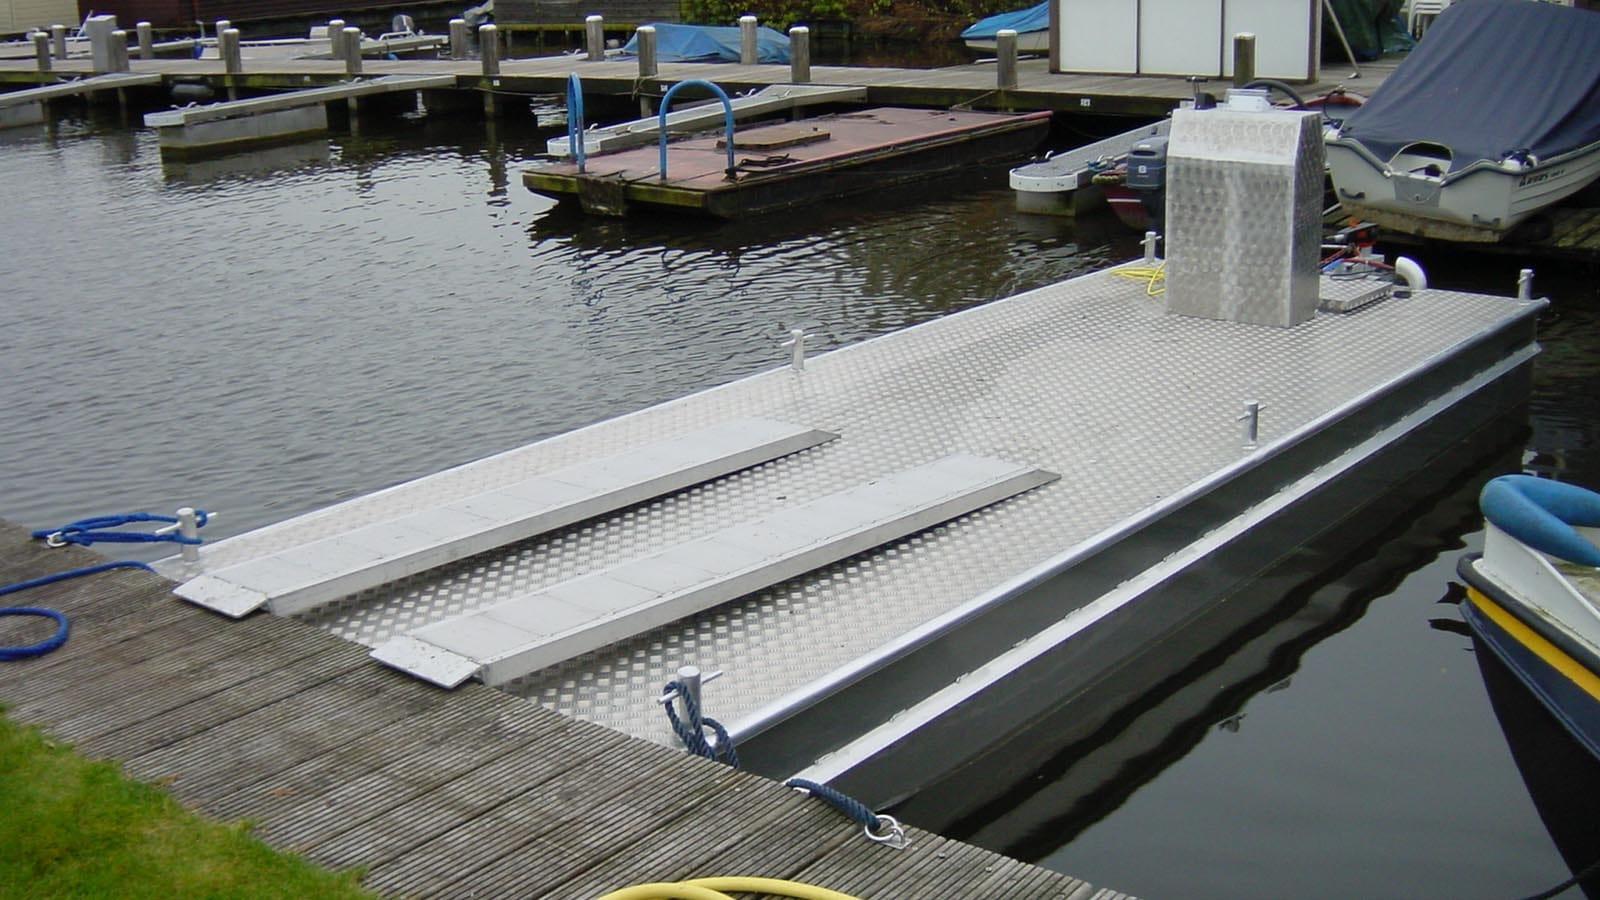 AluminiumJon.nl - Ponton 6 meter - Standaard & Heavy Duty - Custom build aluminium werkpontons